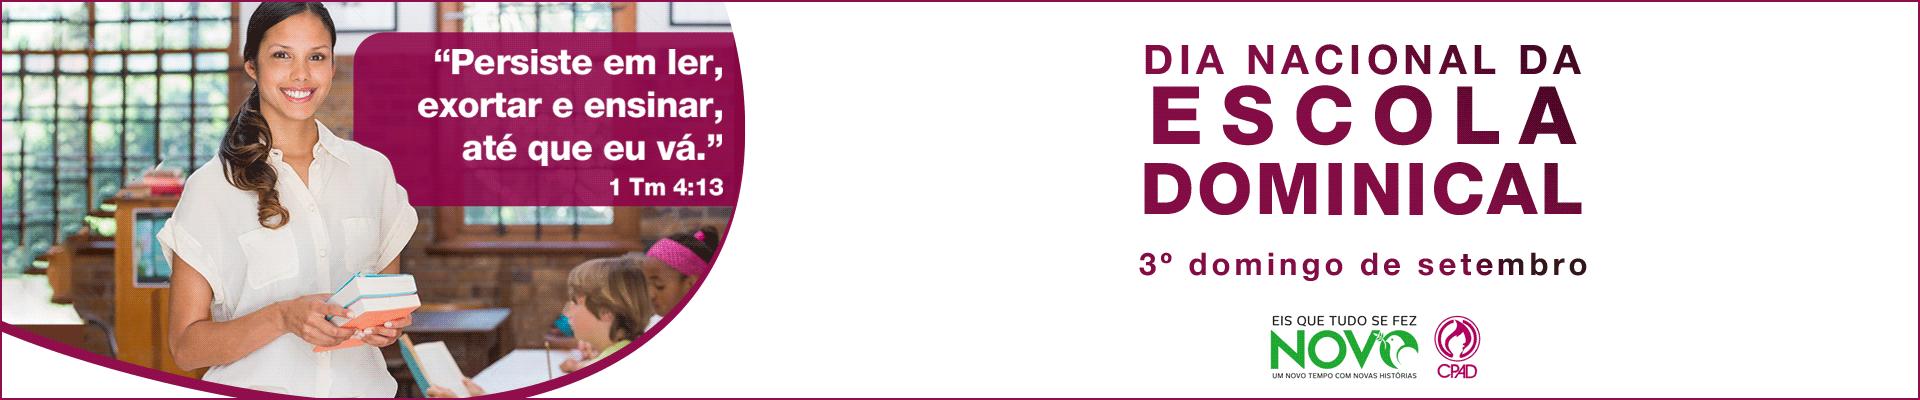 Banner Desktop